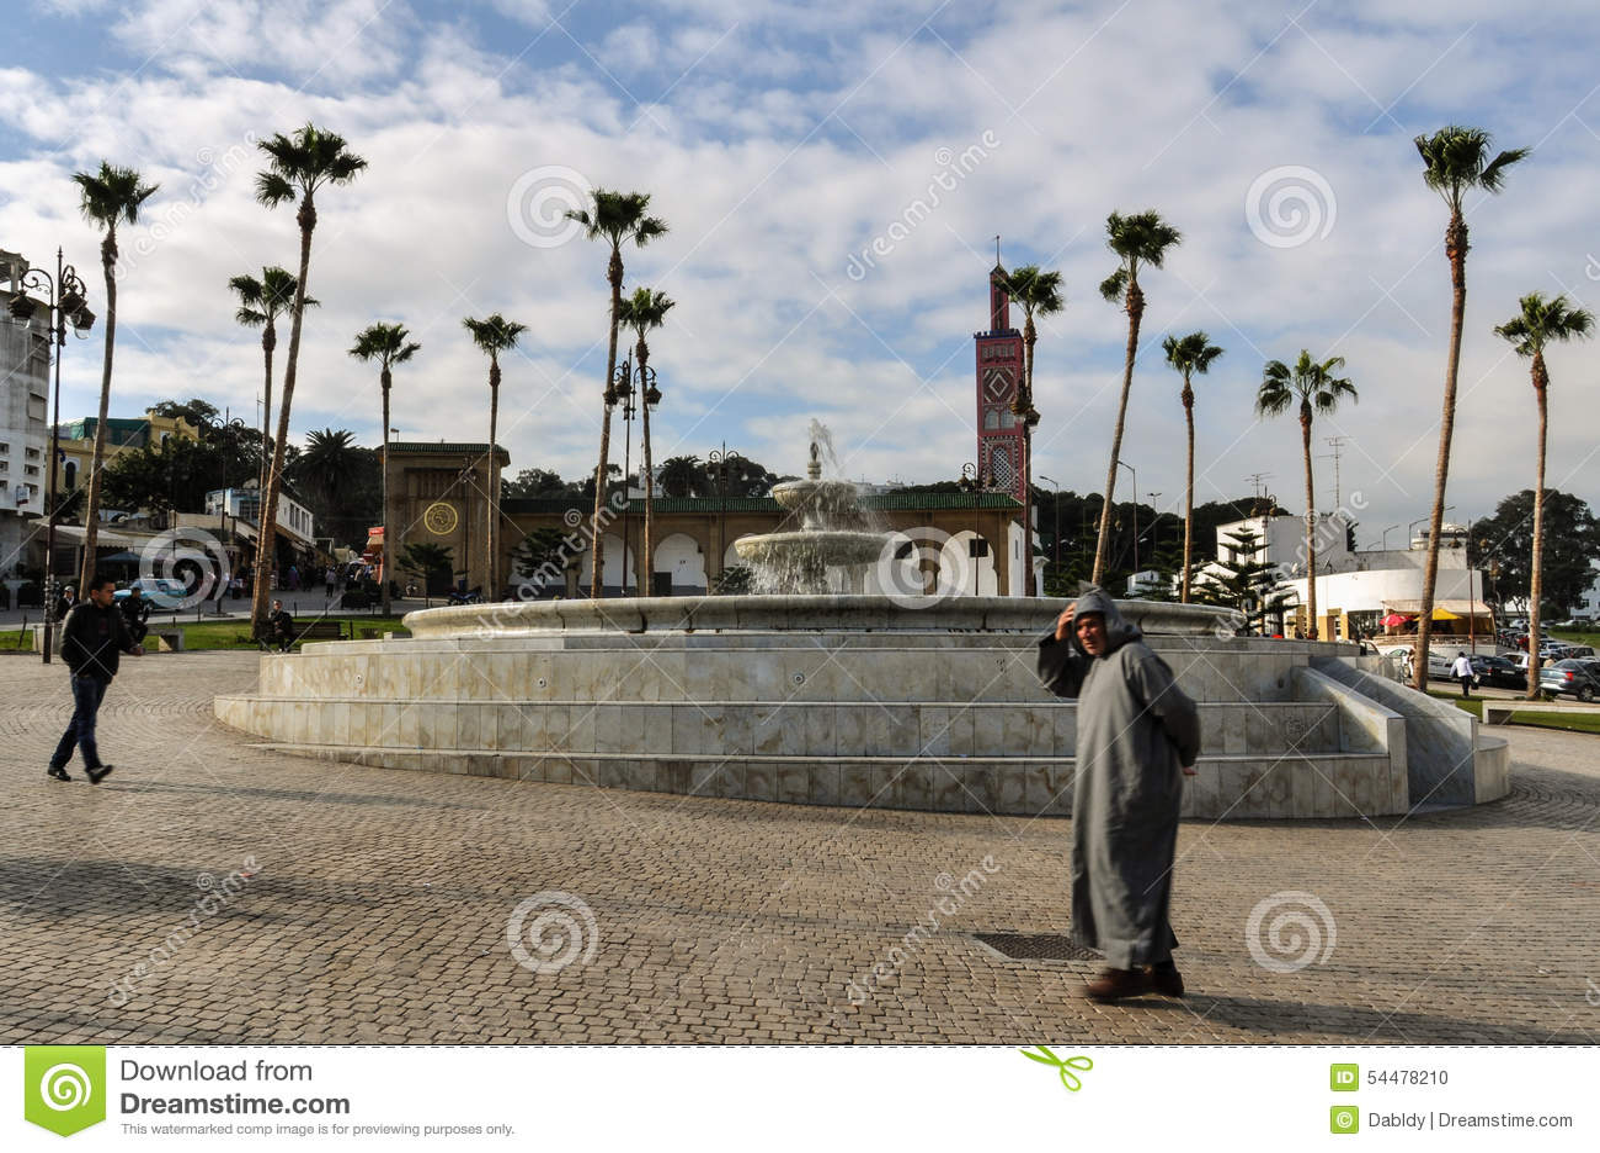 Square in Tangier City, Morocco